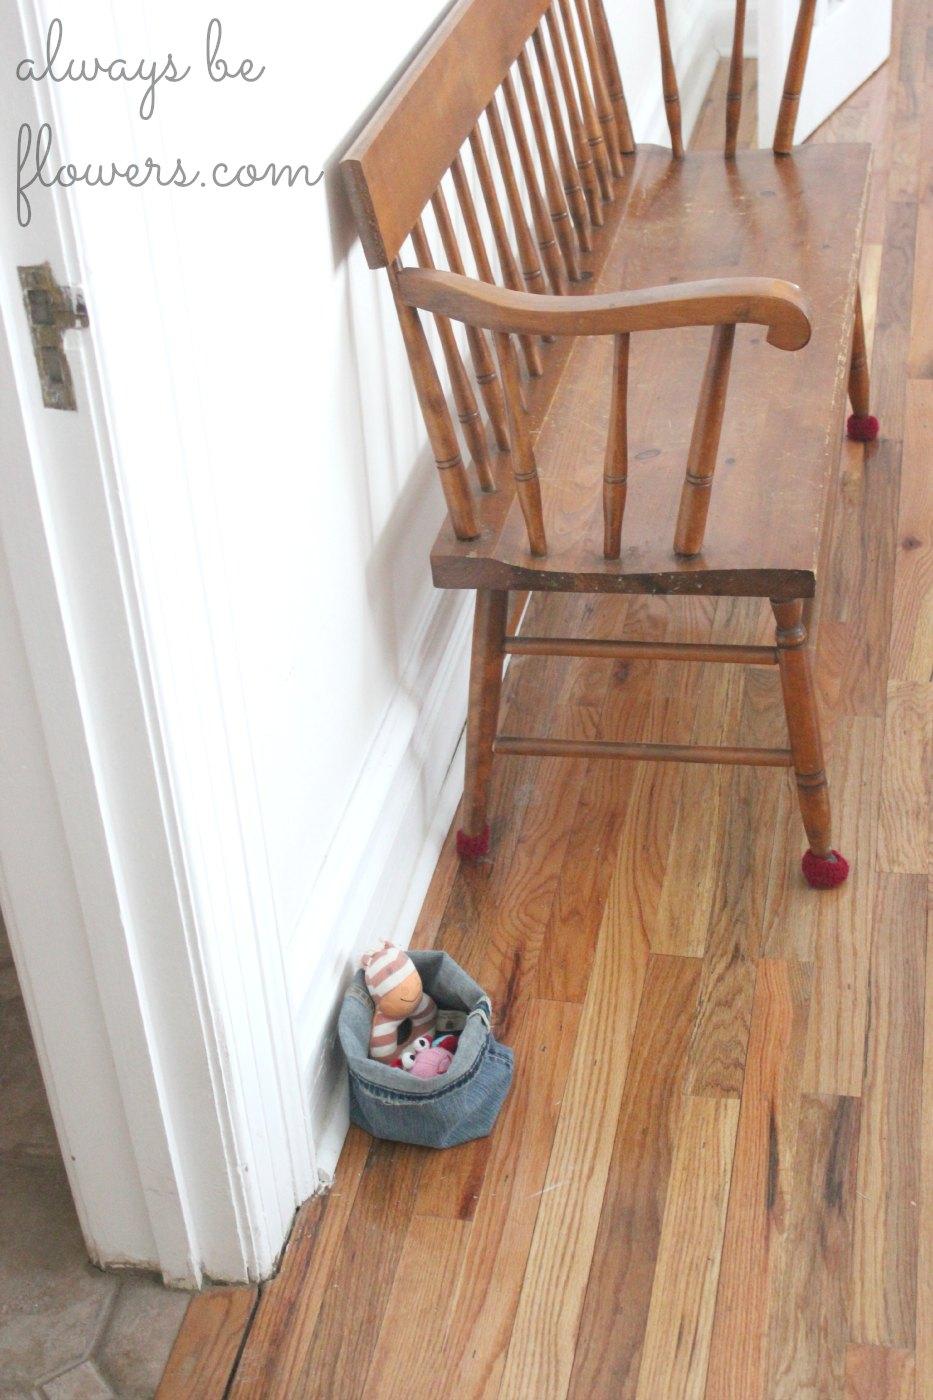 denim-basket-small-toy-storage.jpg